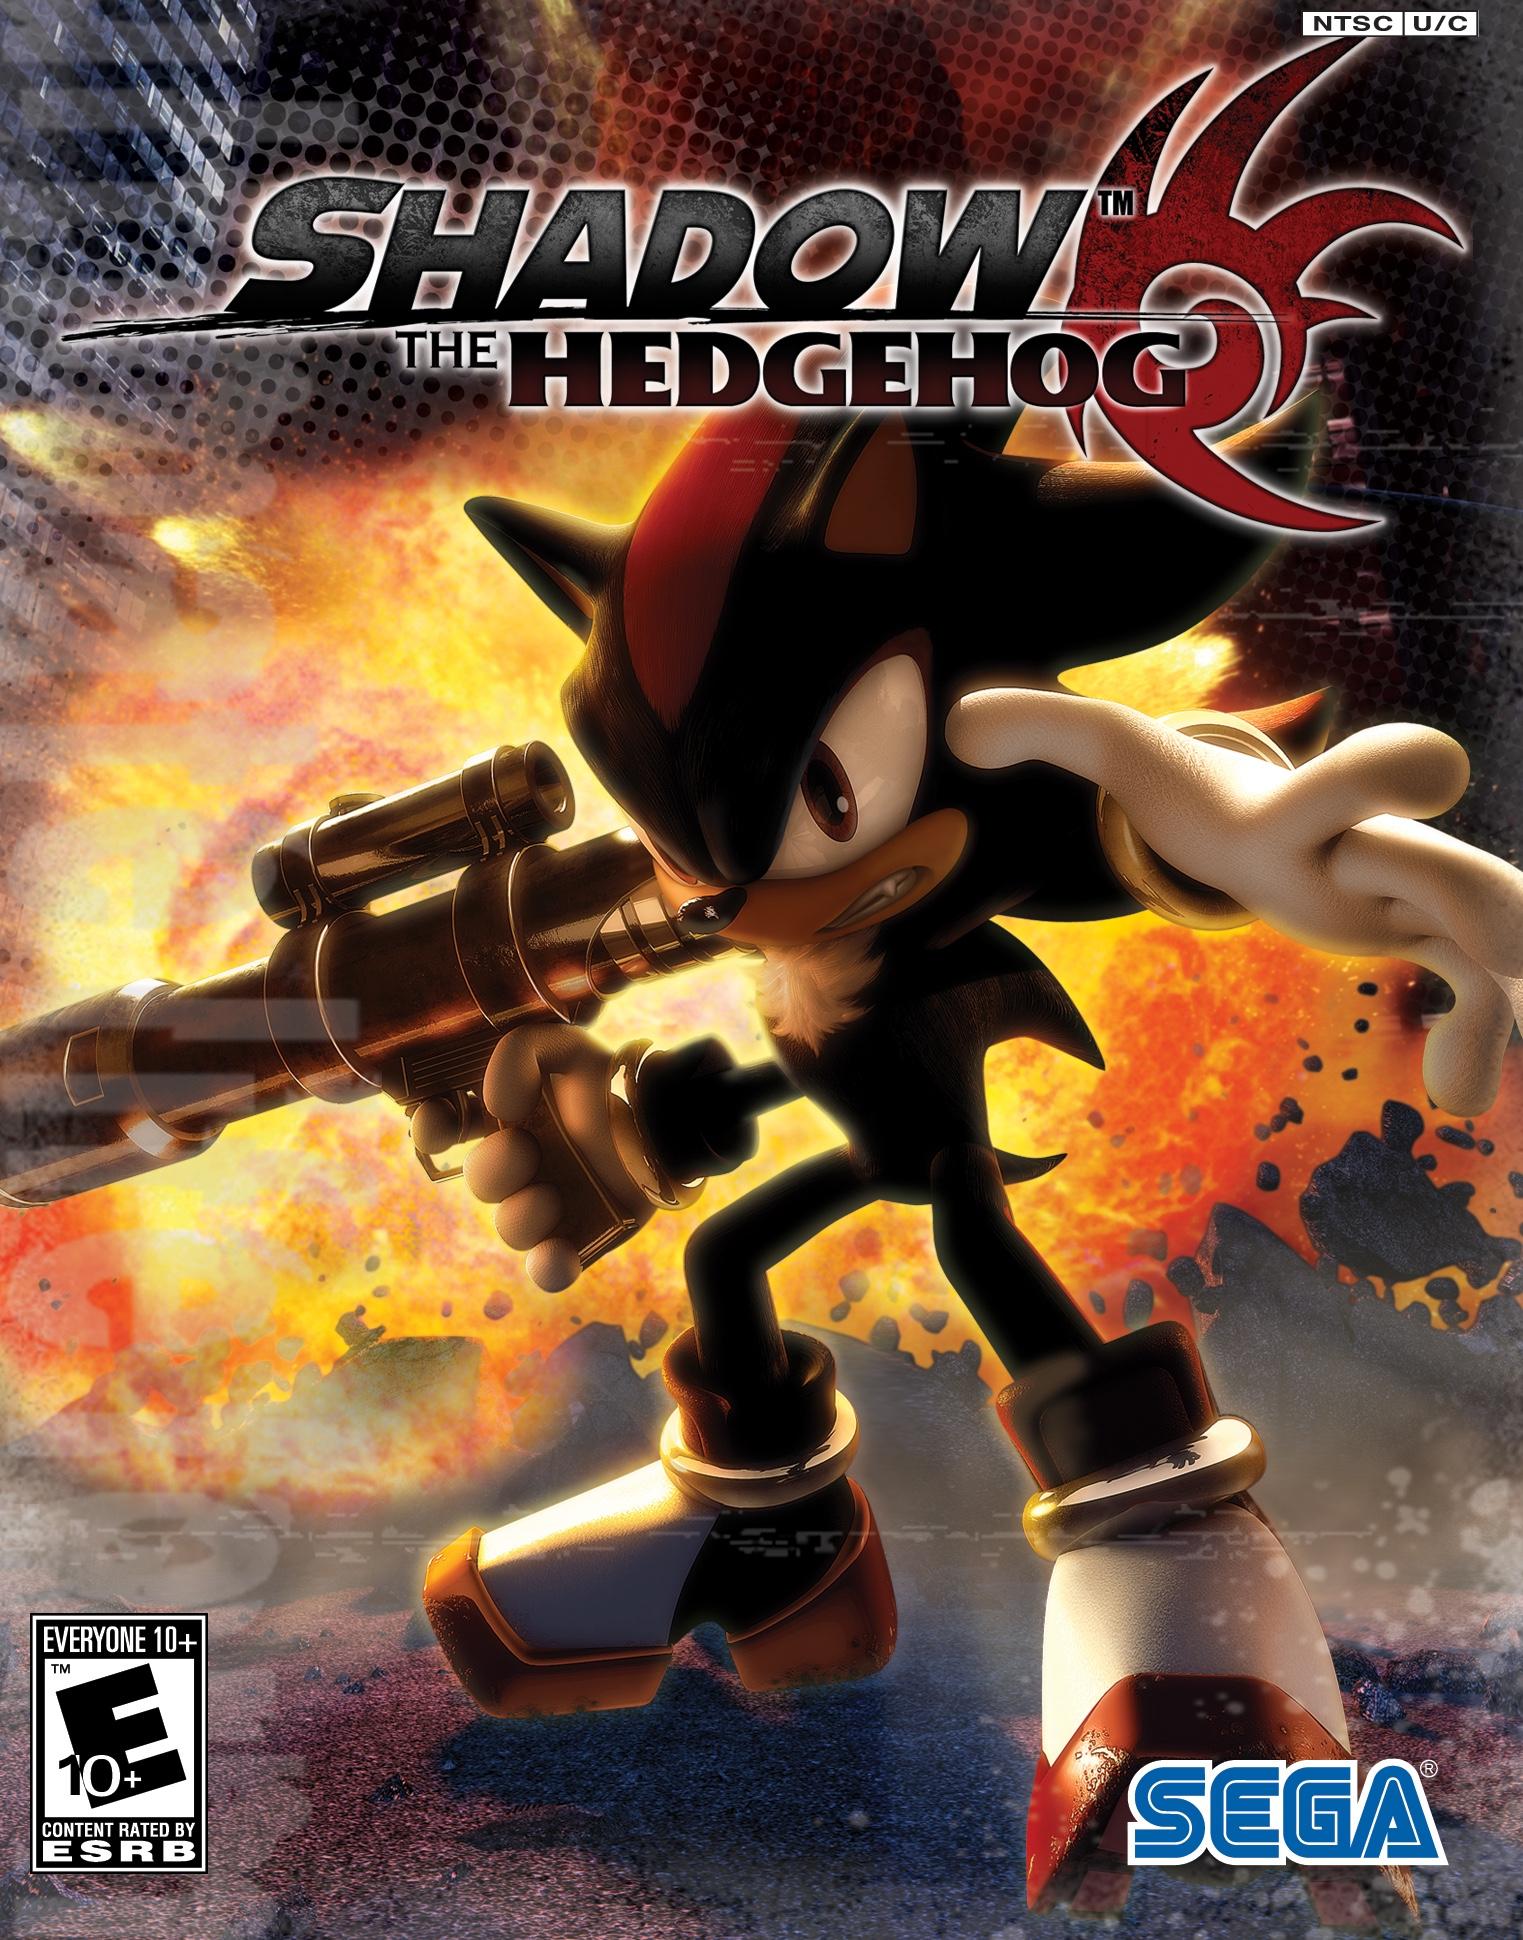 Shadow battle episode 2 newgrounds dating